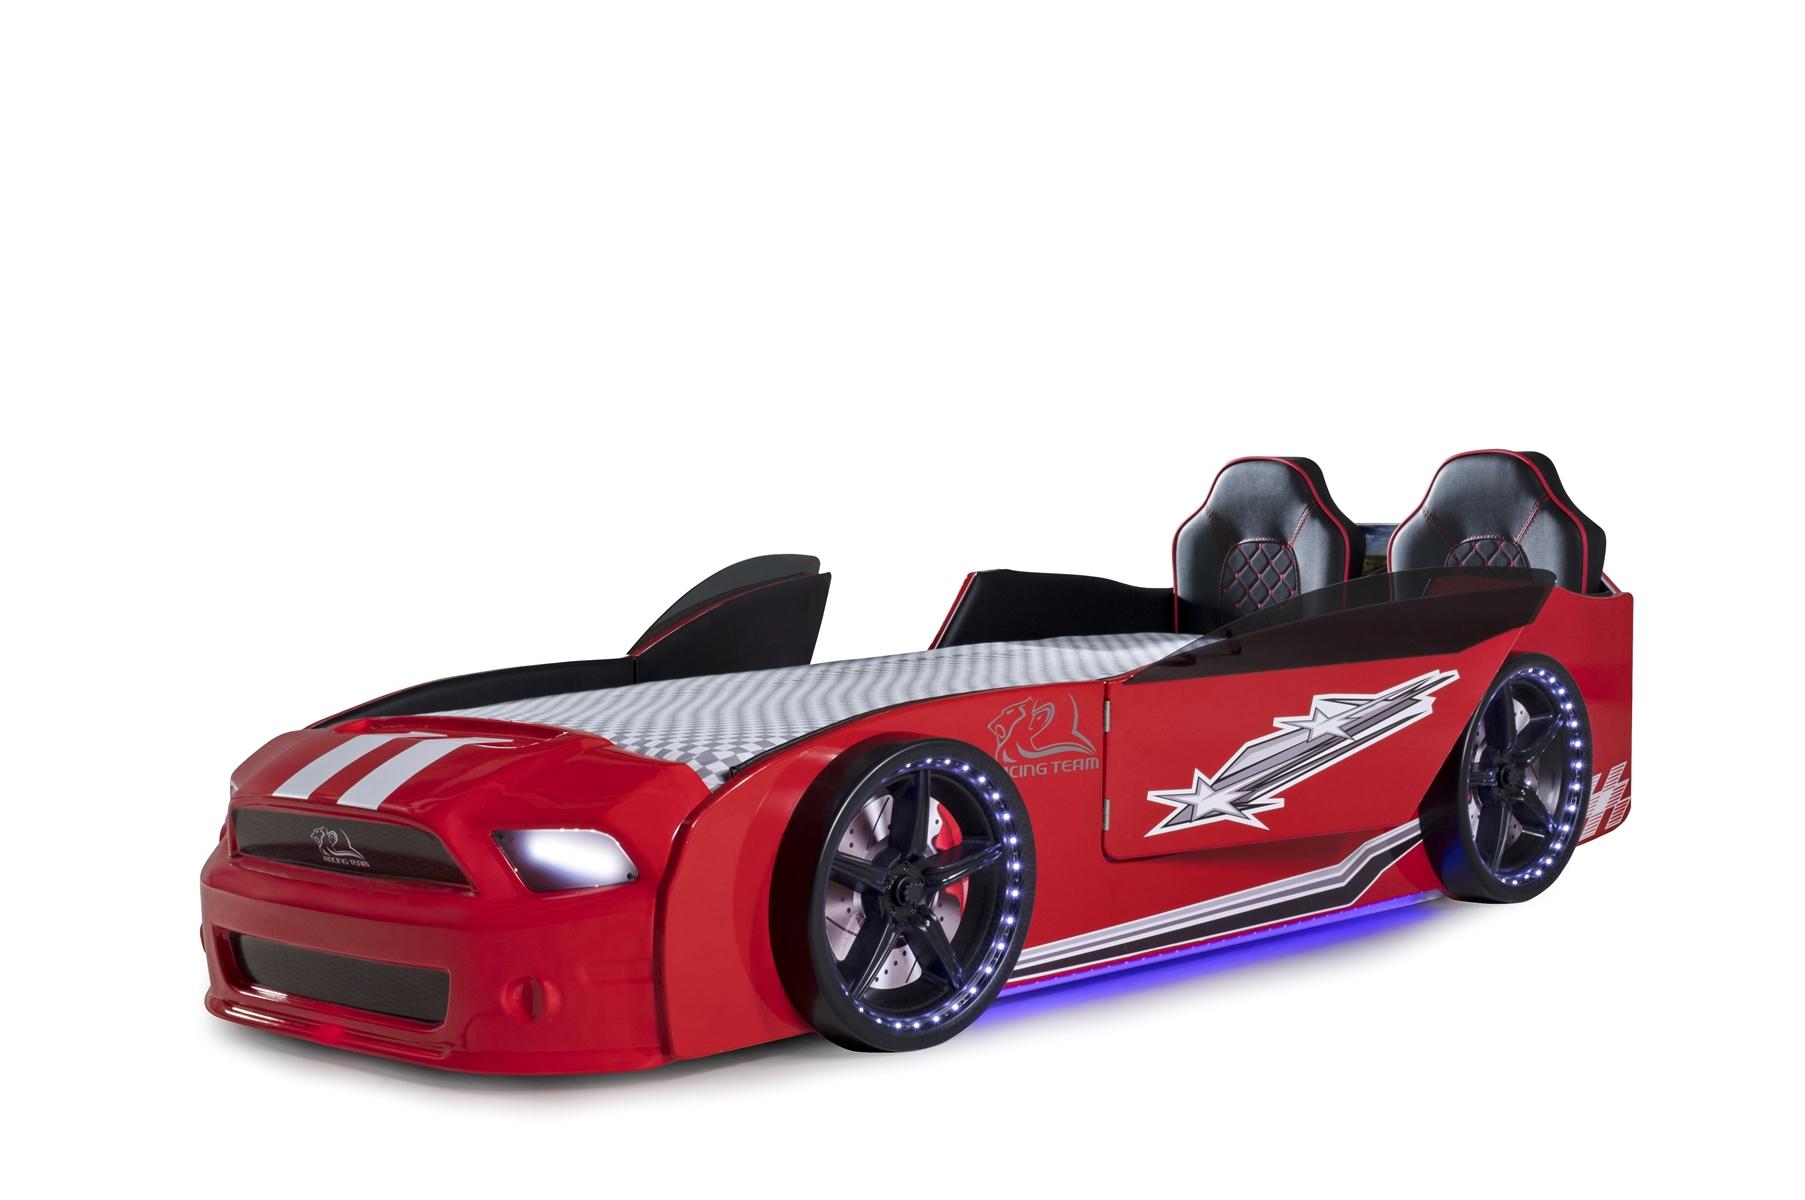 Autobettzimmer Komplett Must Rider Turbo 4-teilig Rot